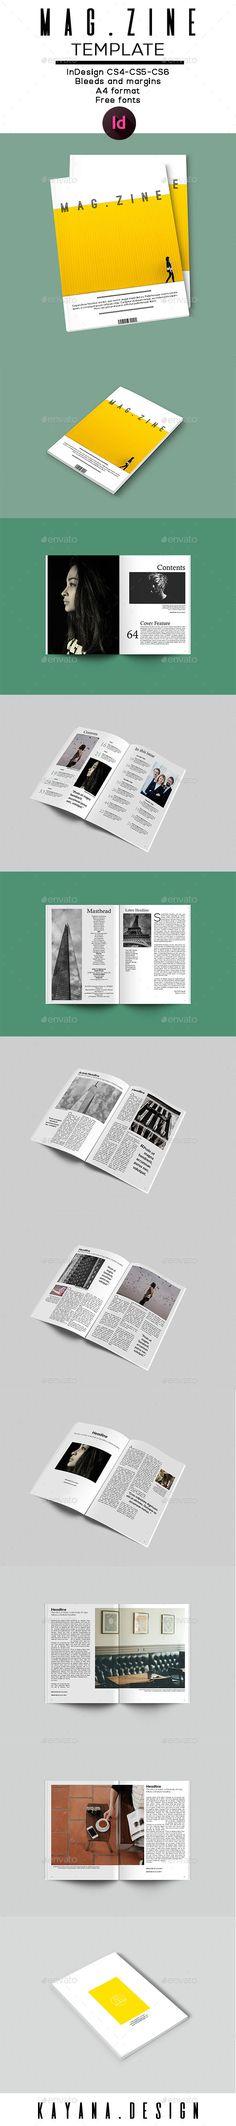 Mag.zine A4 Magazine Template - Brochures Print Templates